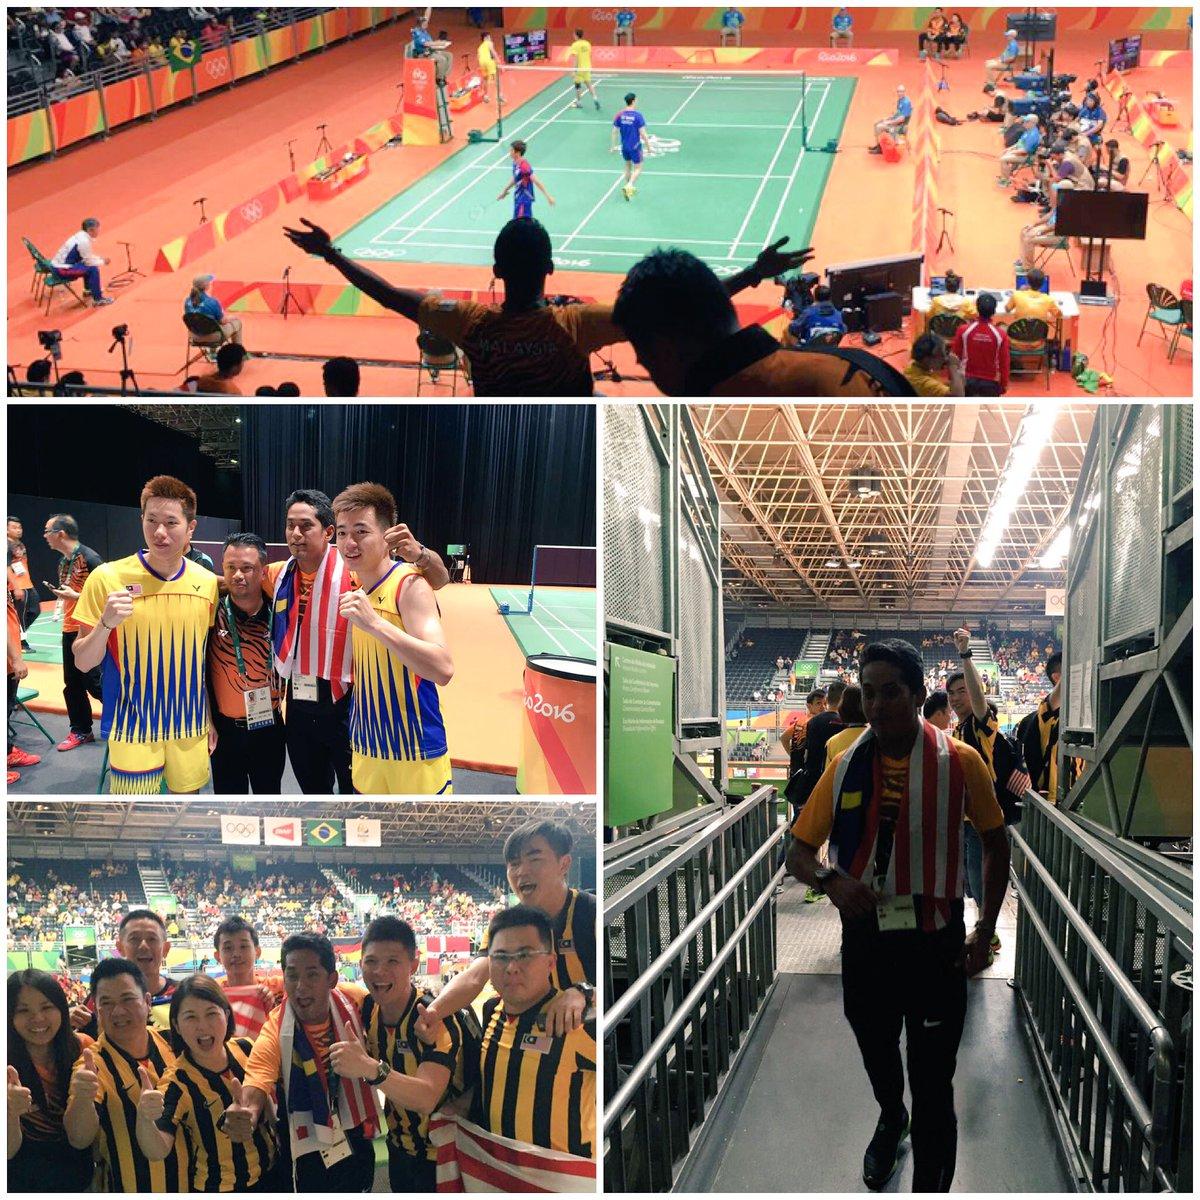 . @Khairykj bersama V Shem/Wee Kiong selepas kemenangan Vs beregu no.1 dunia dari Korea. @TeamMsia #GoTeamMalaysia https://t.co/eUFnZvcOQl